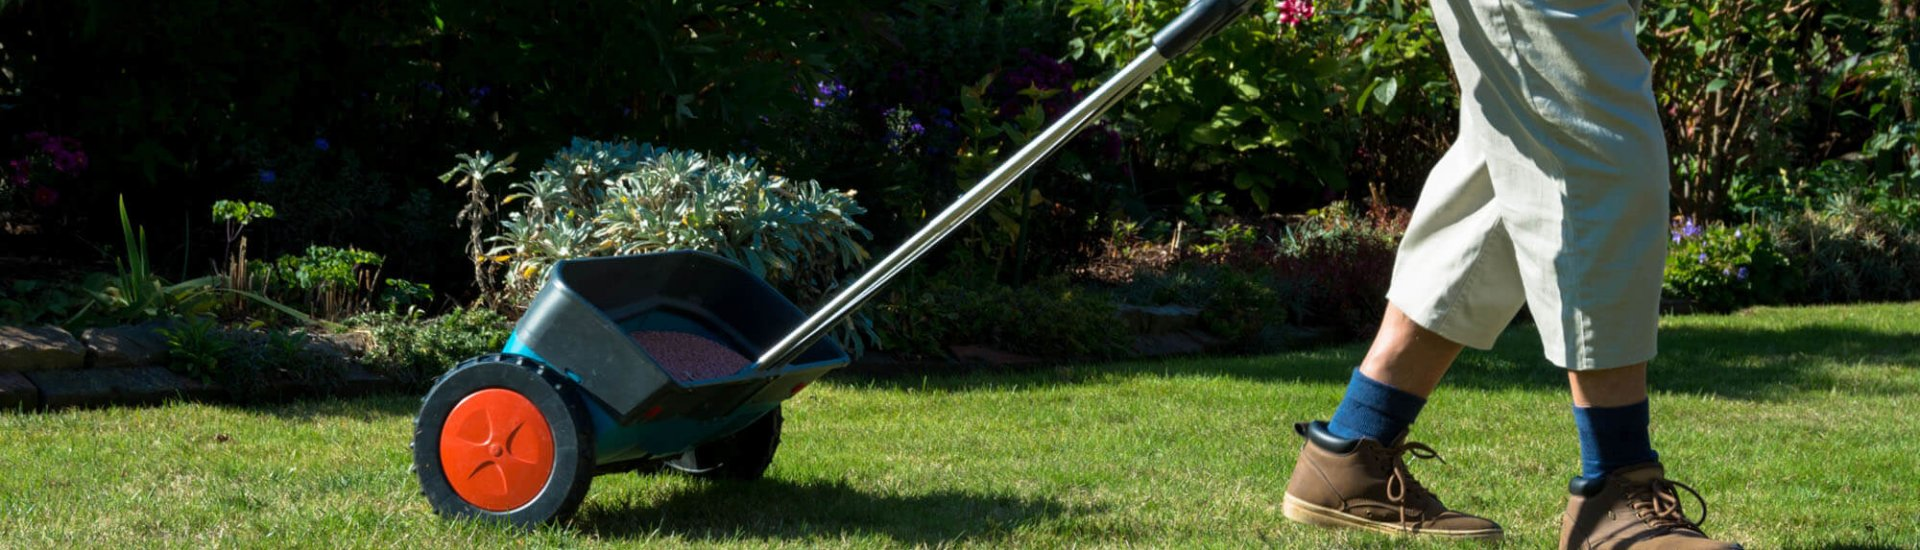 Rasen düngen: Zeitpunkt, Dünger, Häufigkeit & FAQ